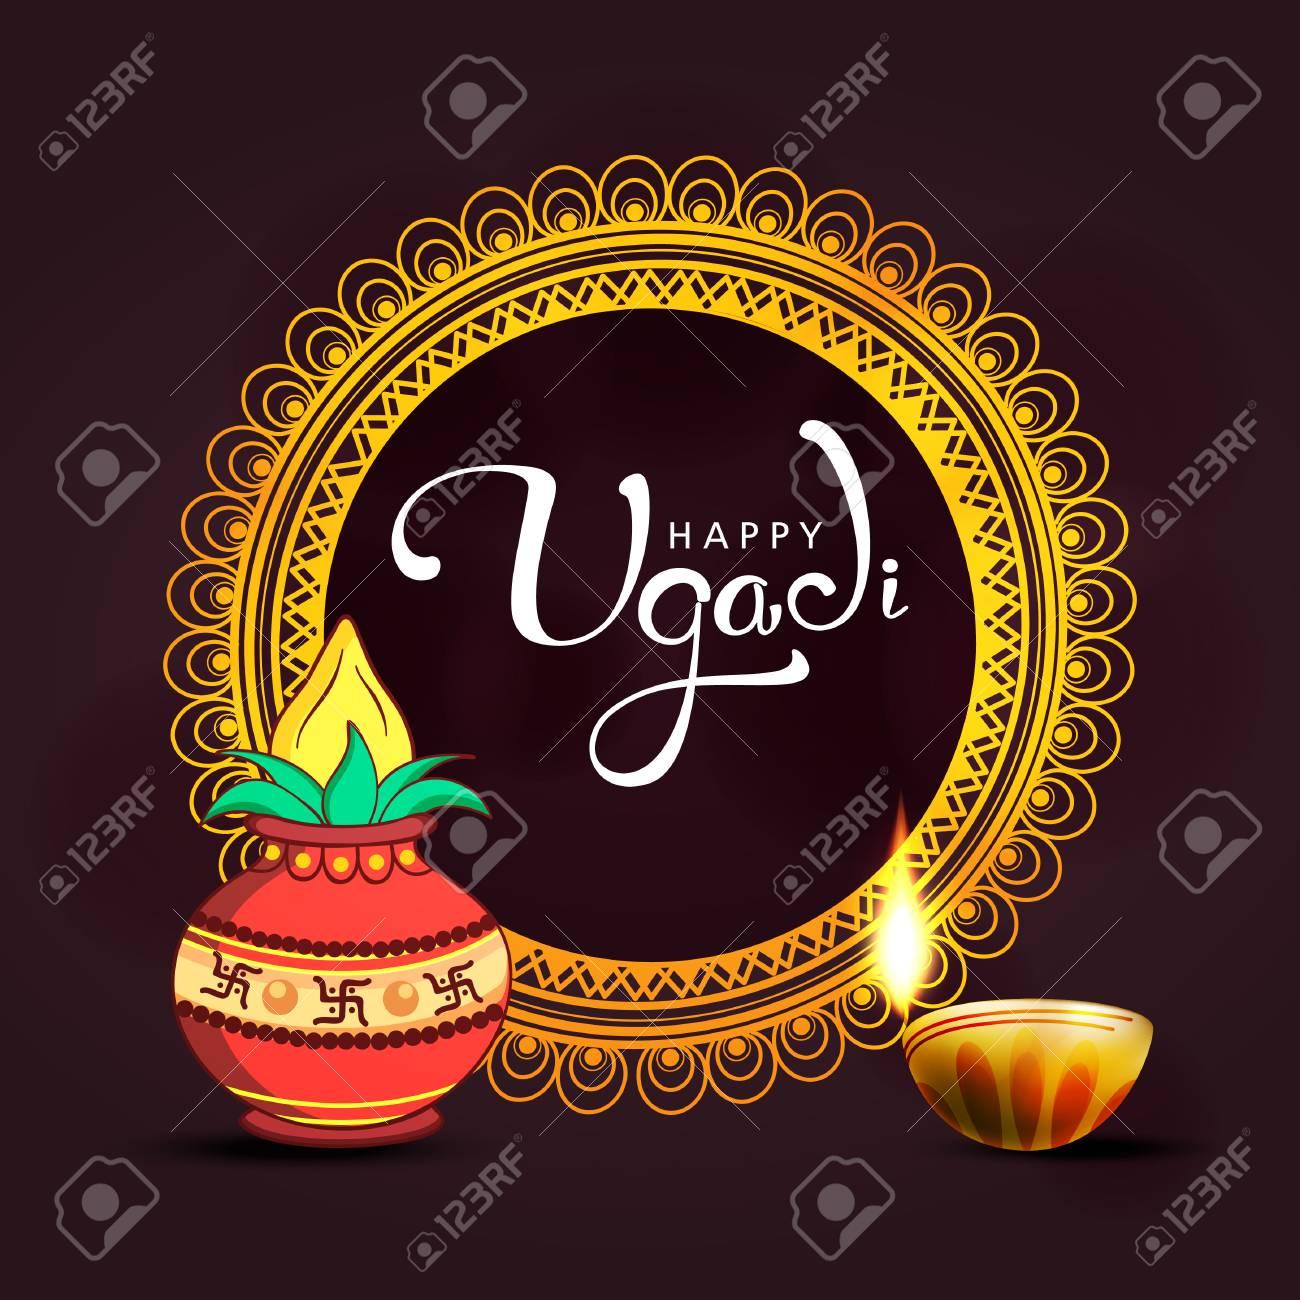 Happy Ugadi 2018 With Lamp And Mandala Pattern On Black Background